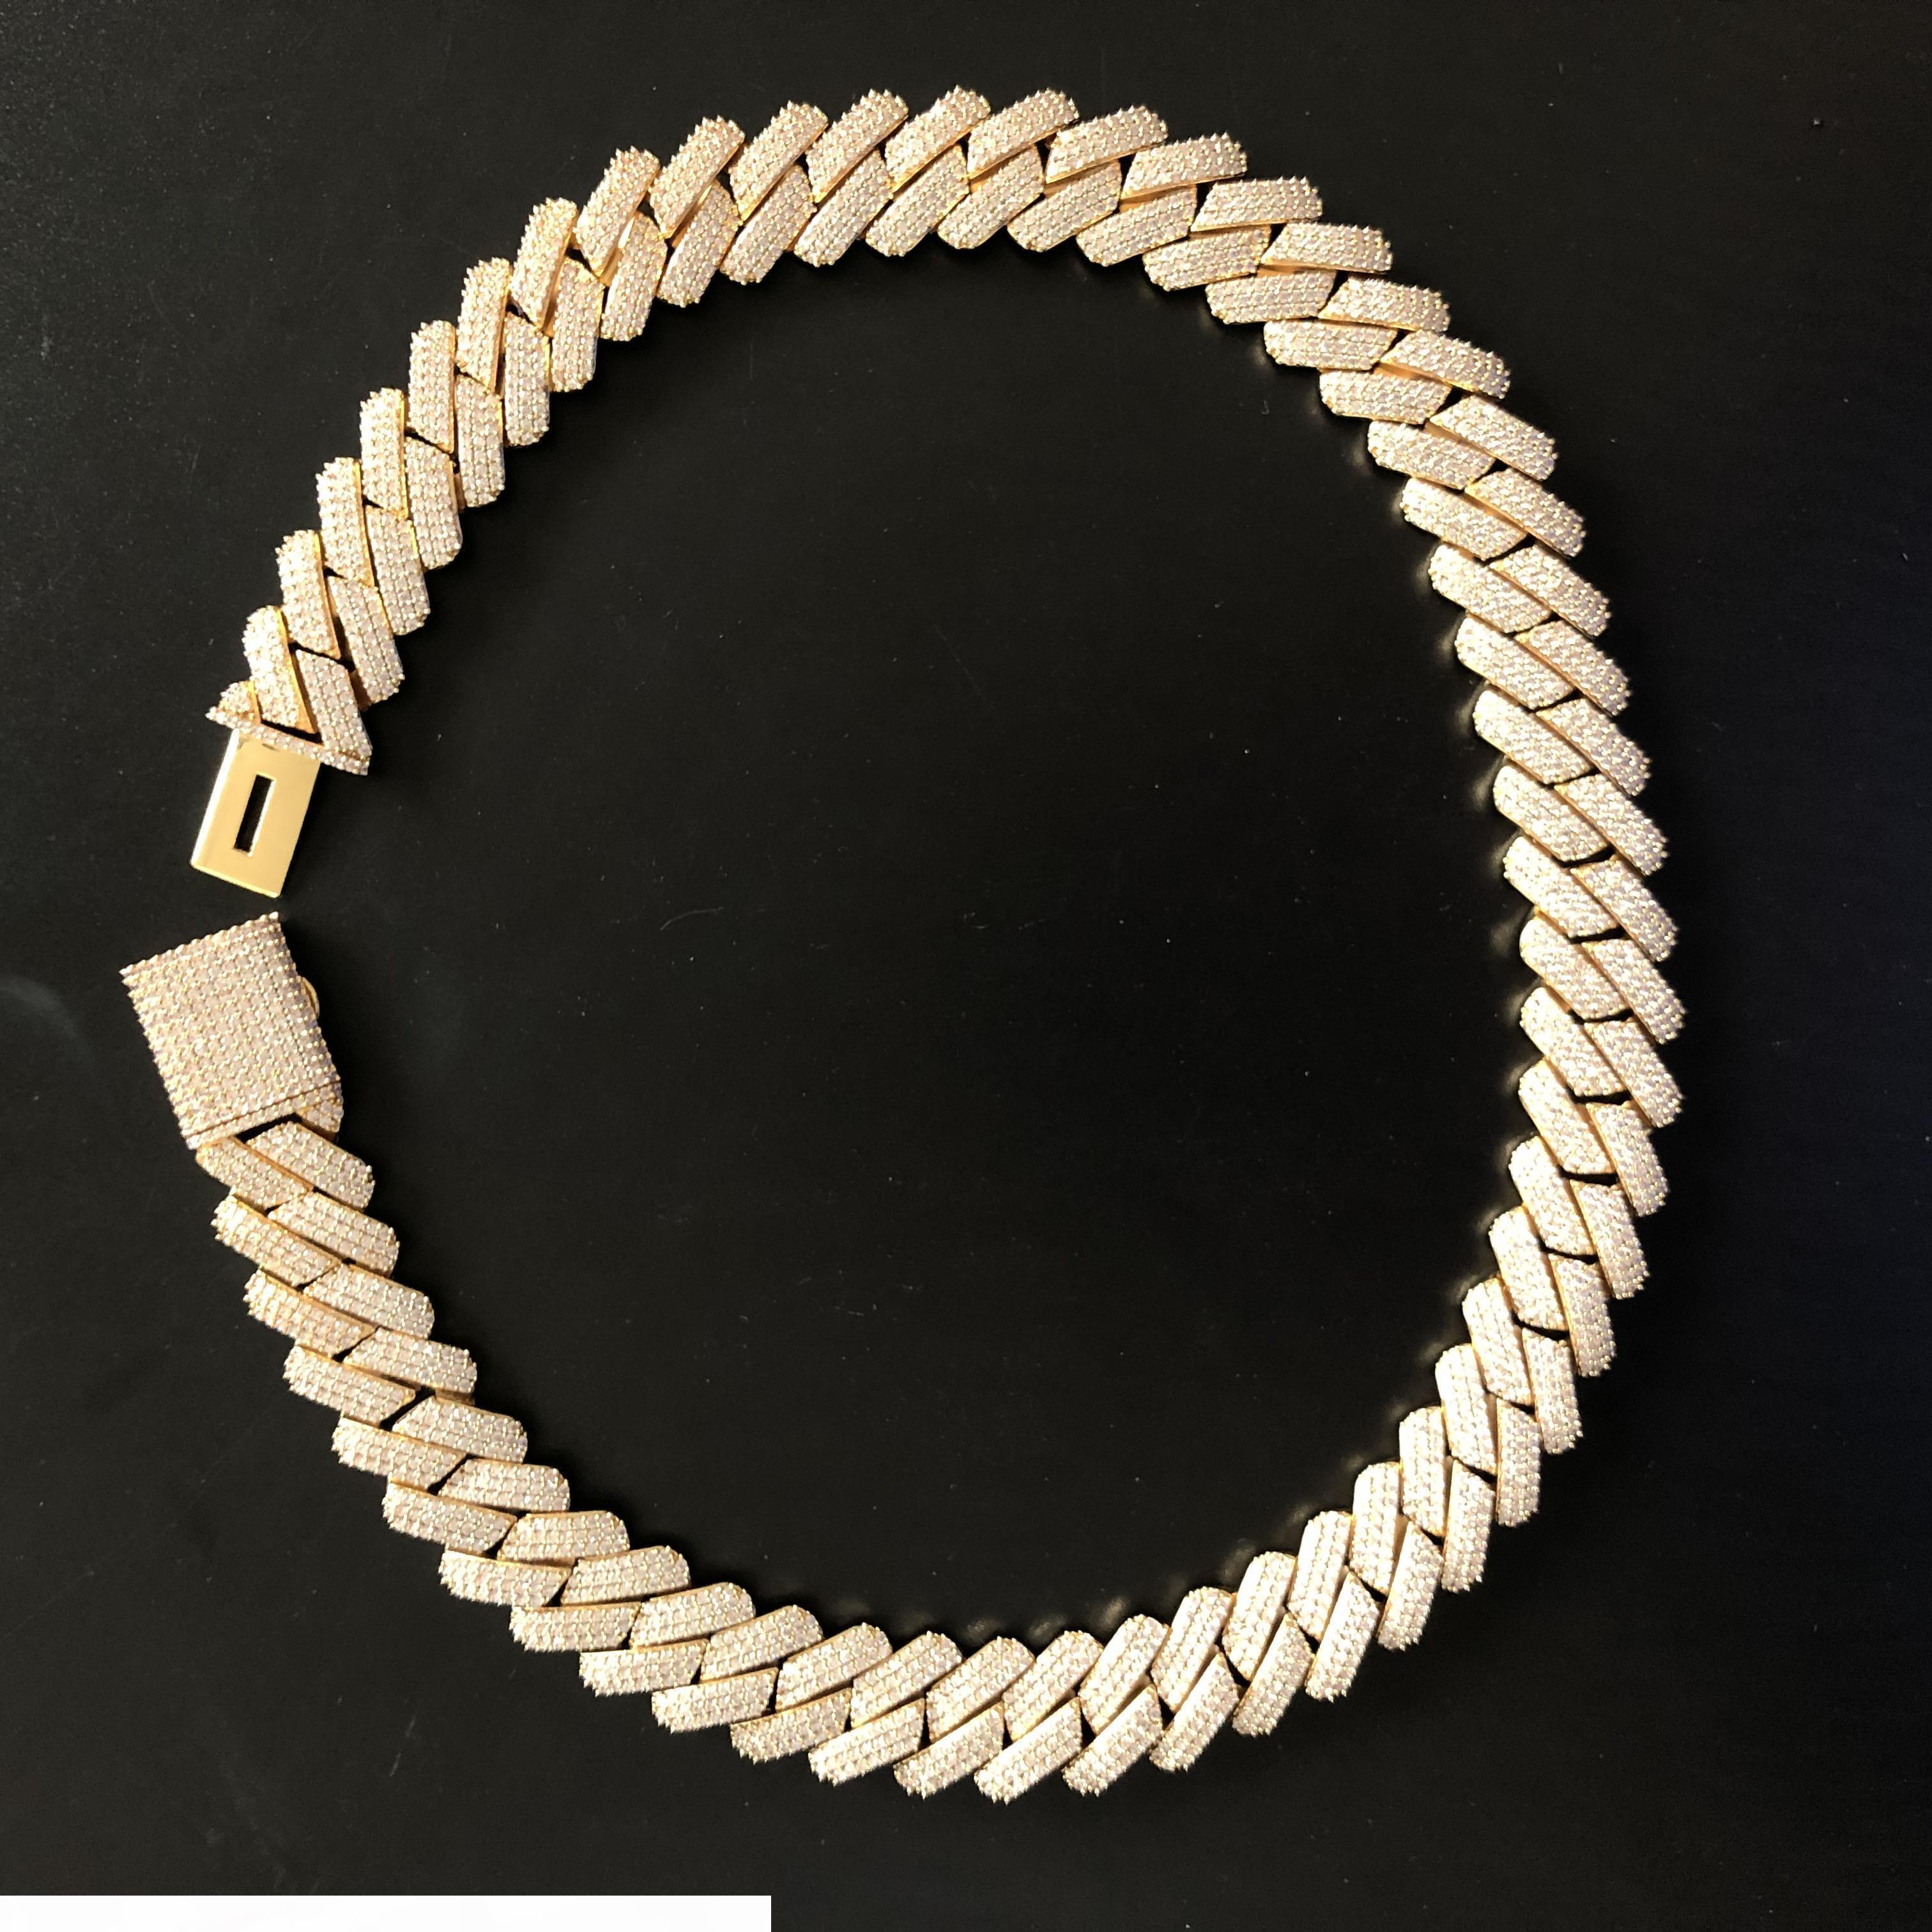 Chains 19 milímetros completa Iced Out pesado cubano colar Prong Definir Colar